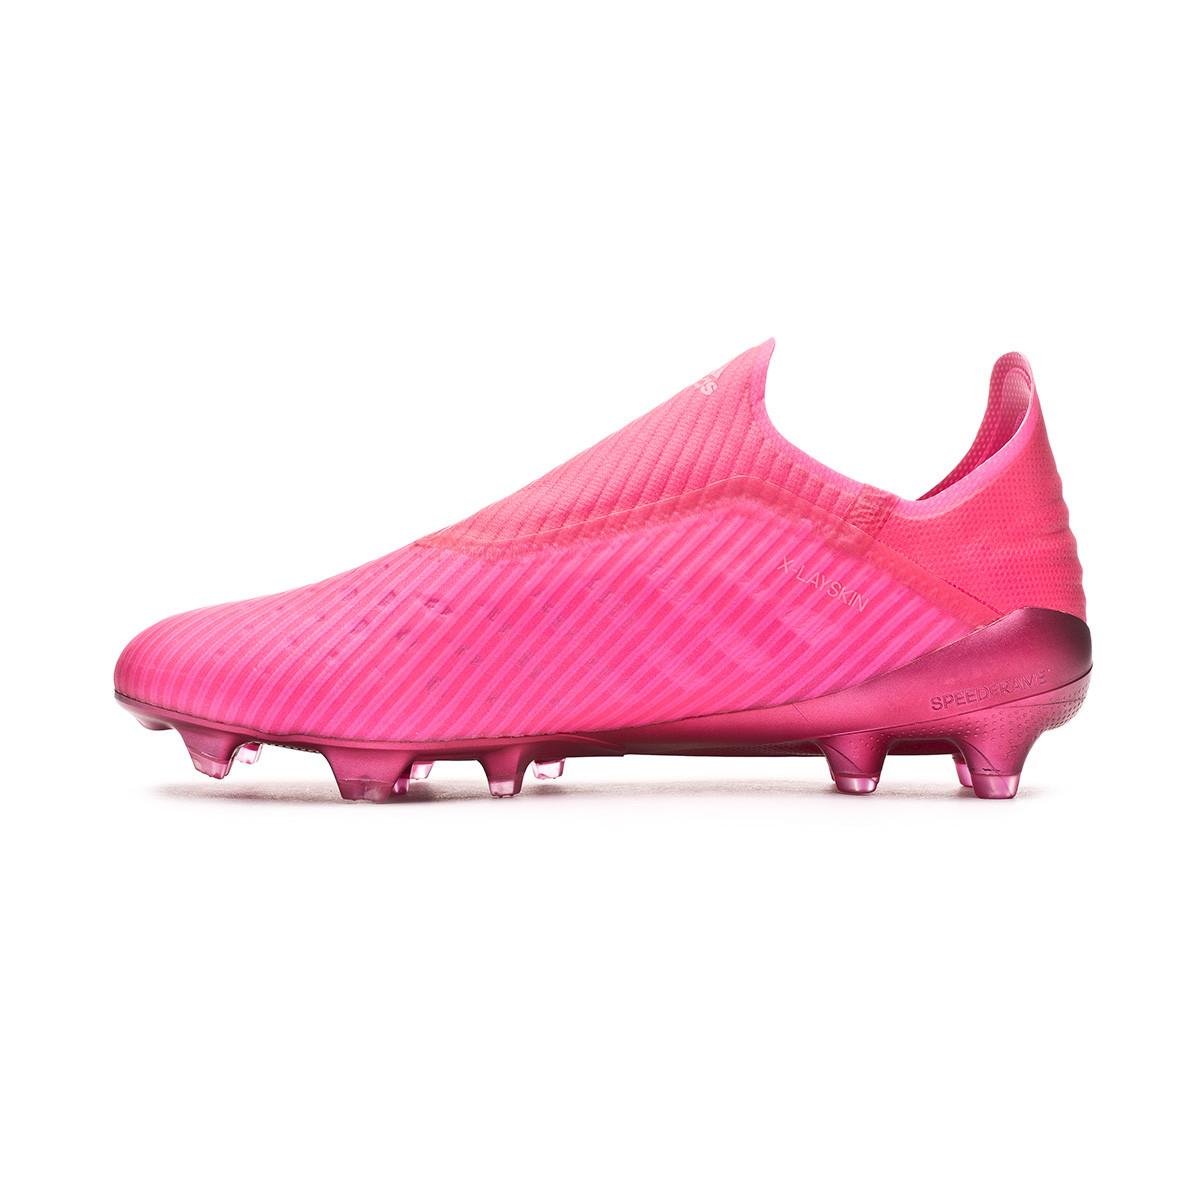 Football Boots adidas X 19+ FG Shock